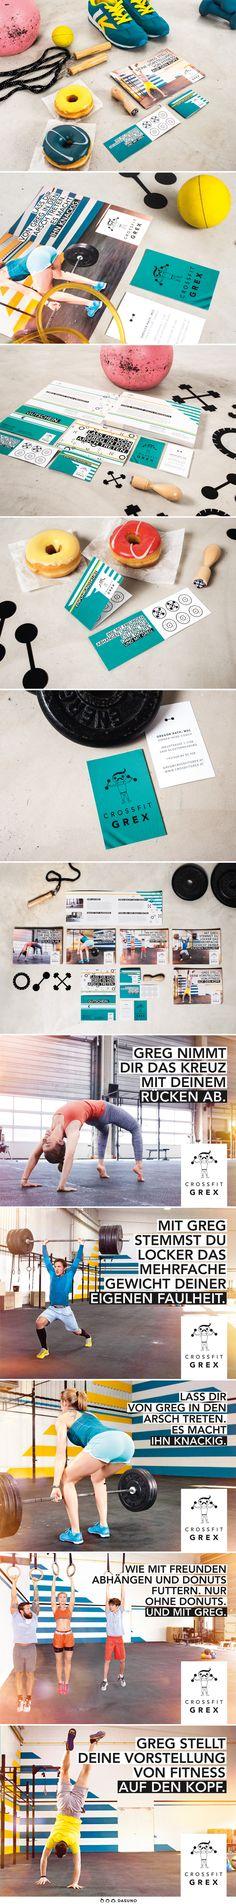 DASUNO // Client: CrossFit Grex // Print // 2015